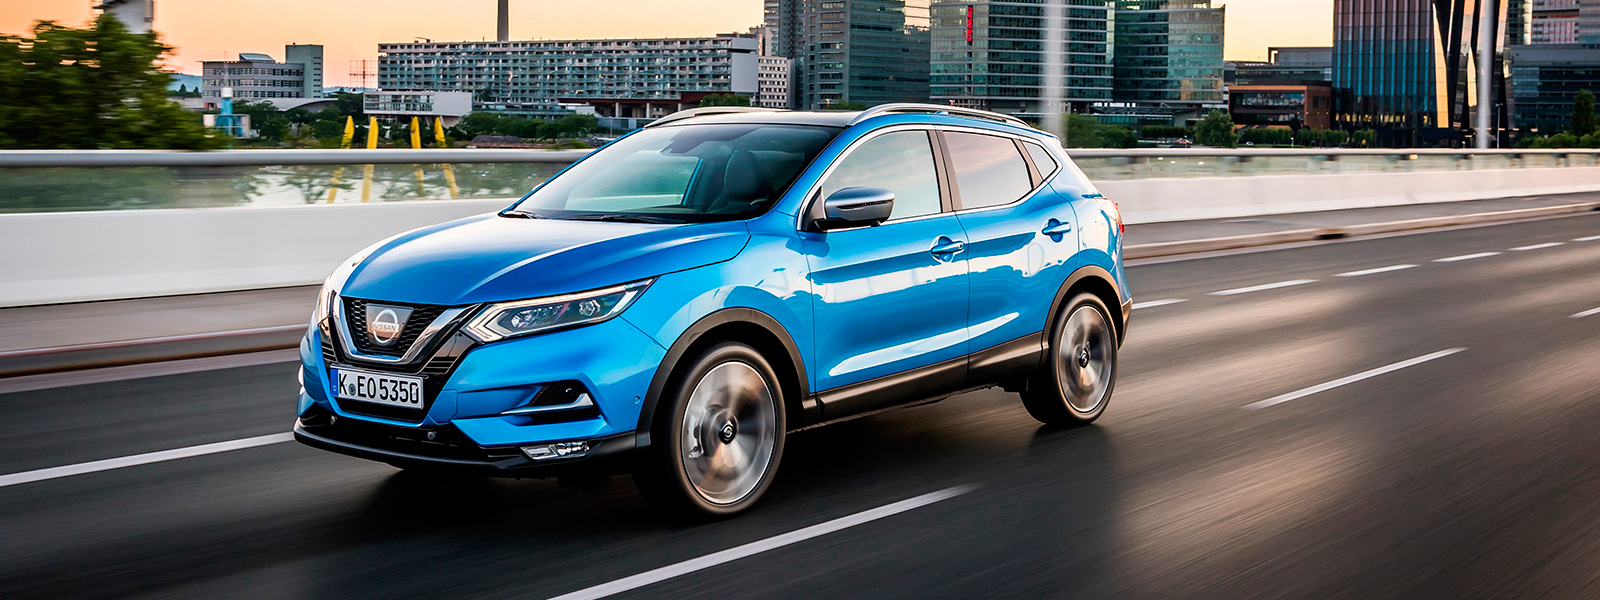 Nissan Qashqai azul